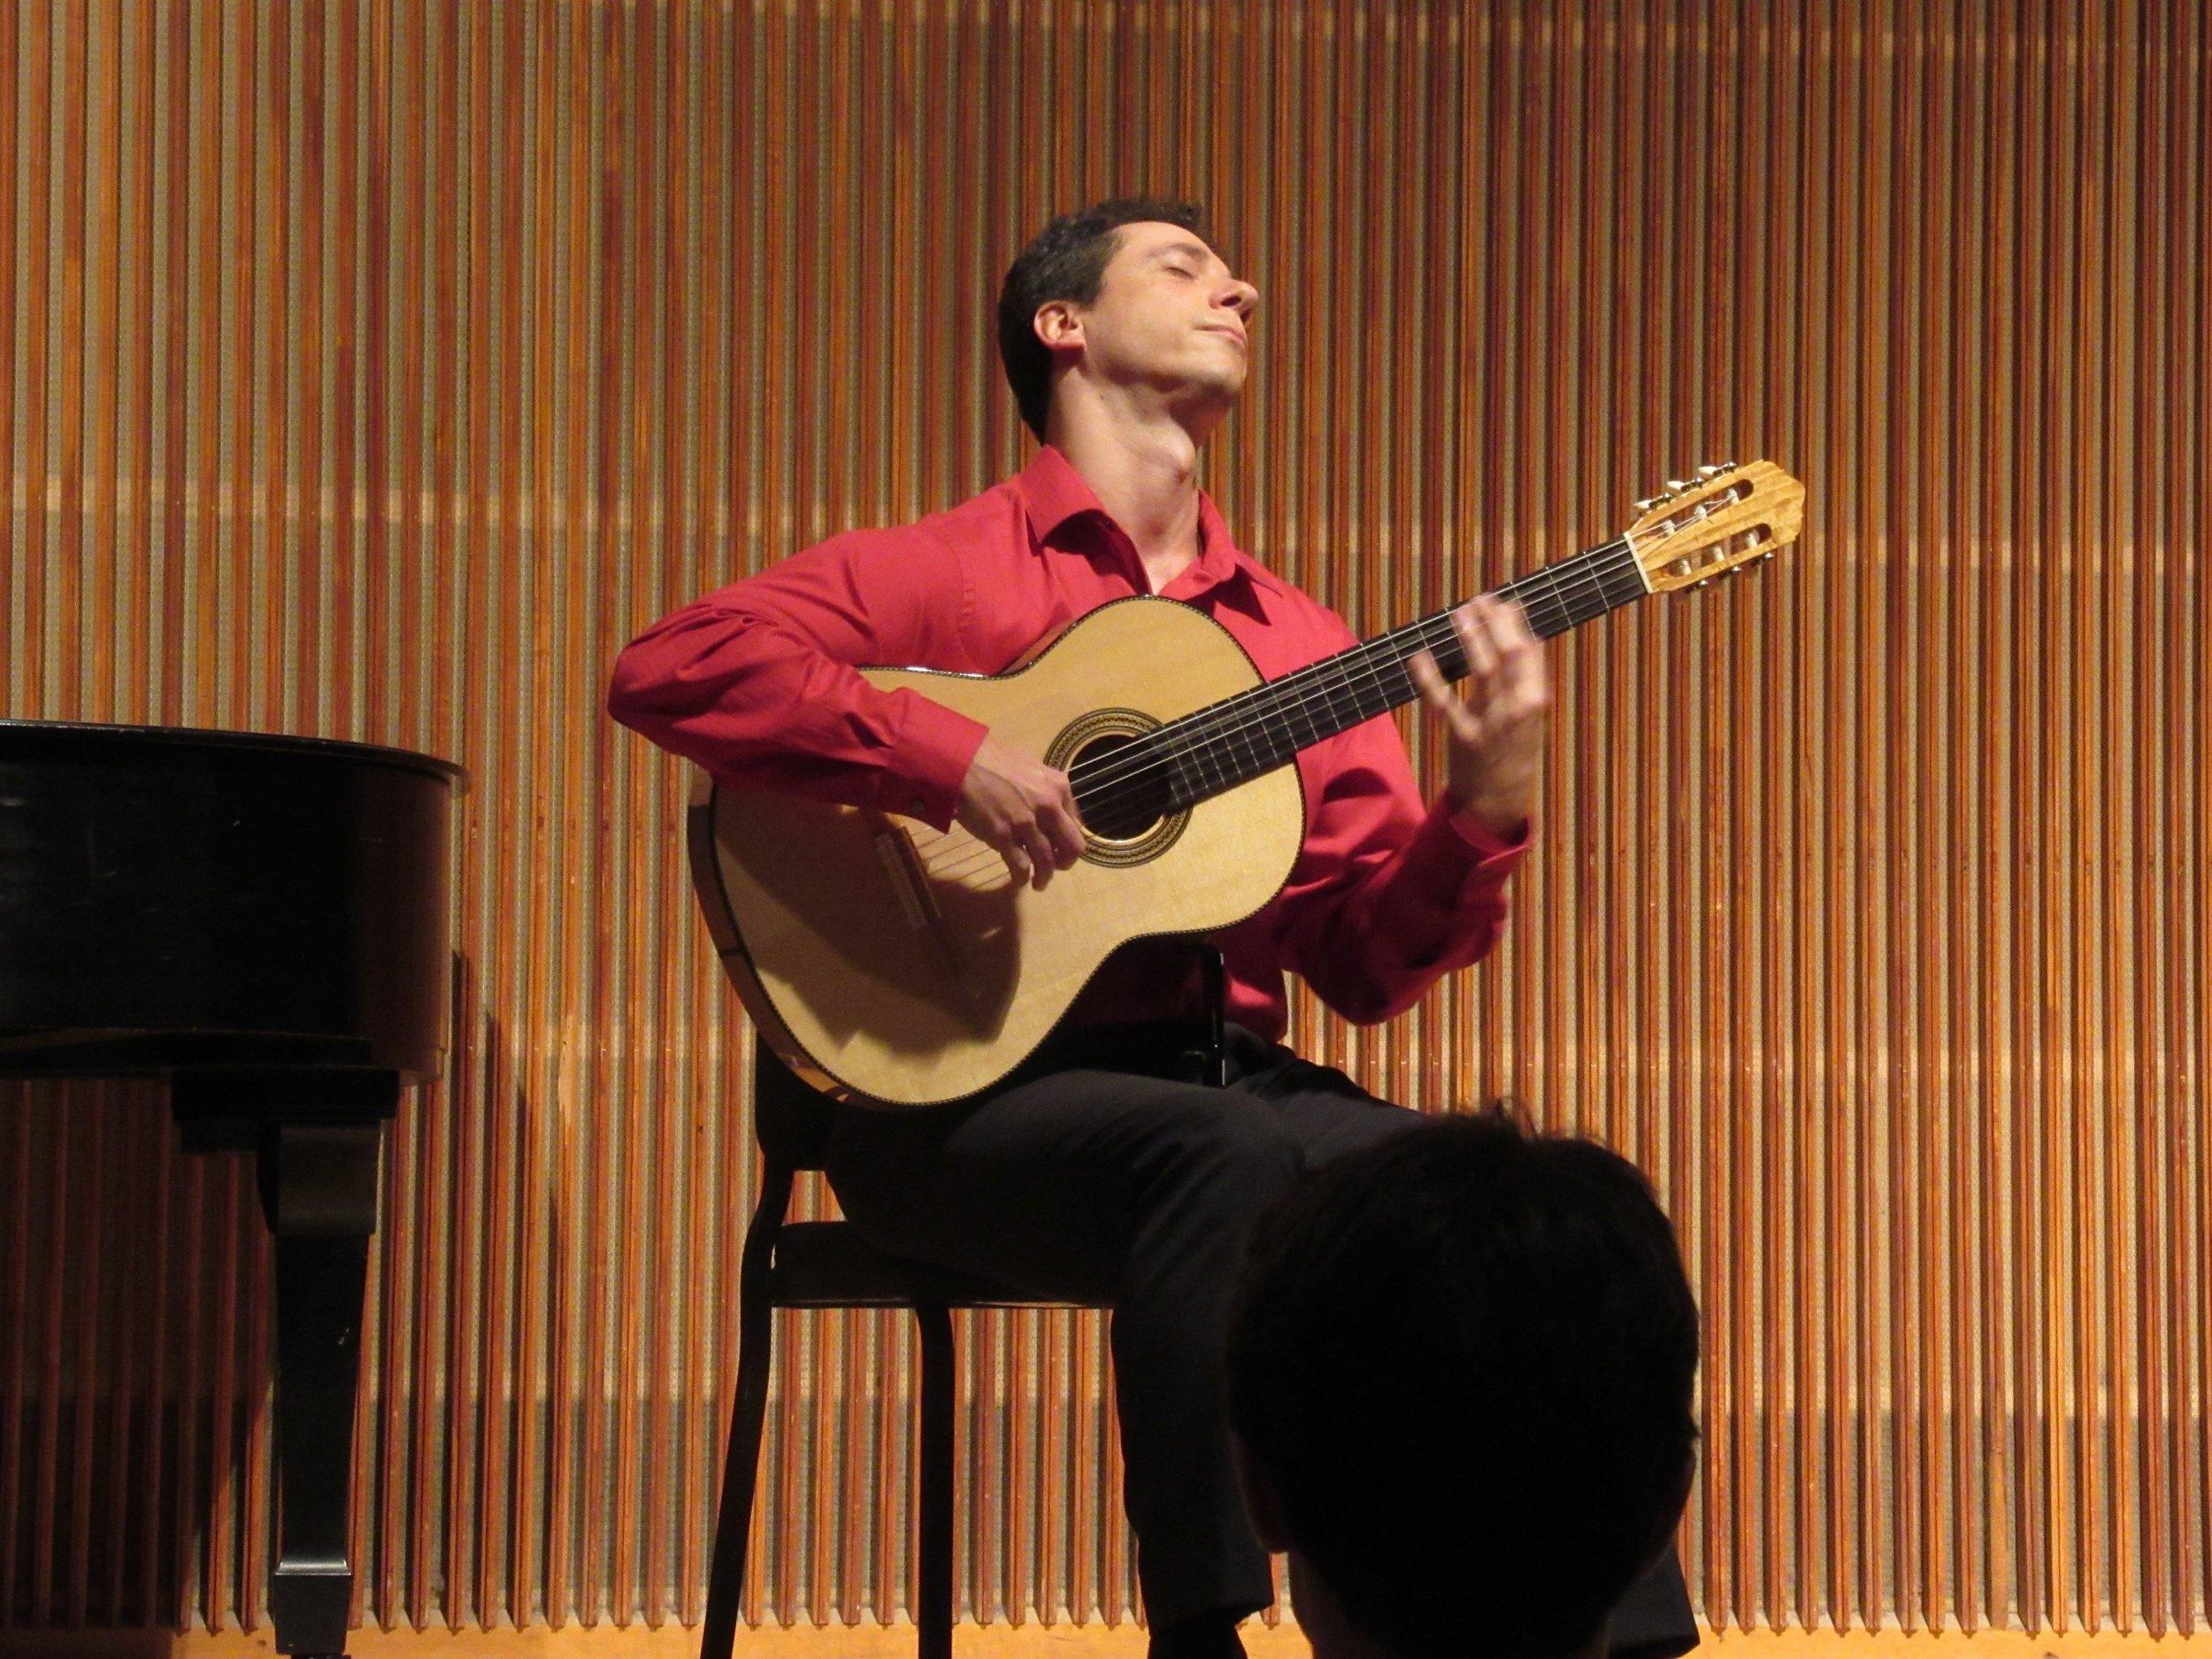 Goryachev plays solo in Kulas Hall at Oberlin.